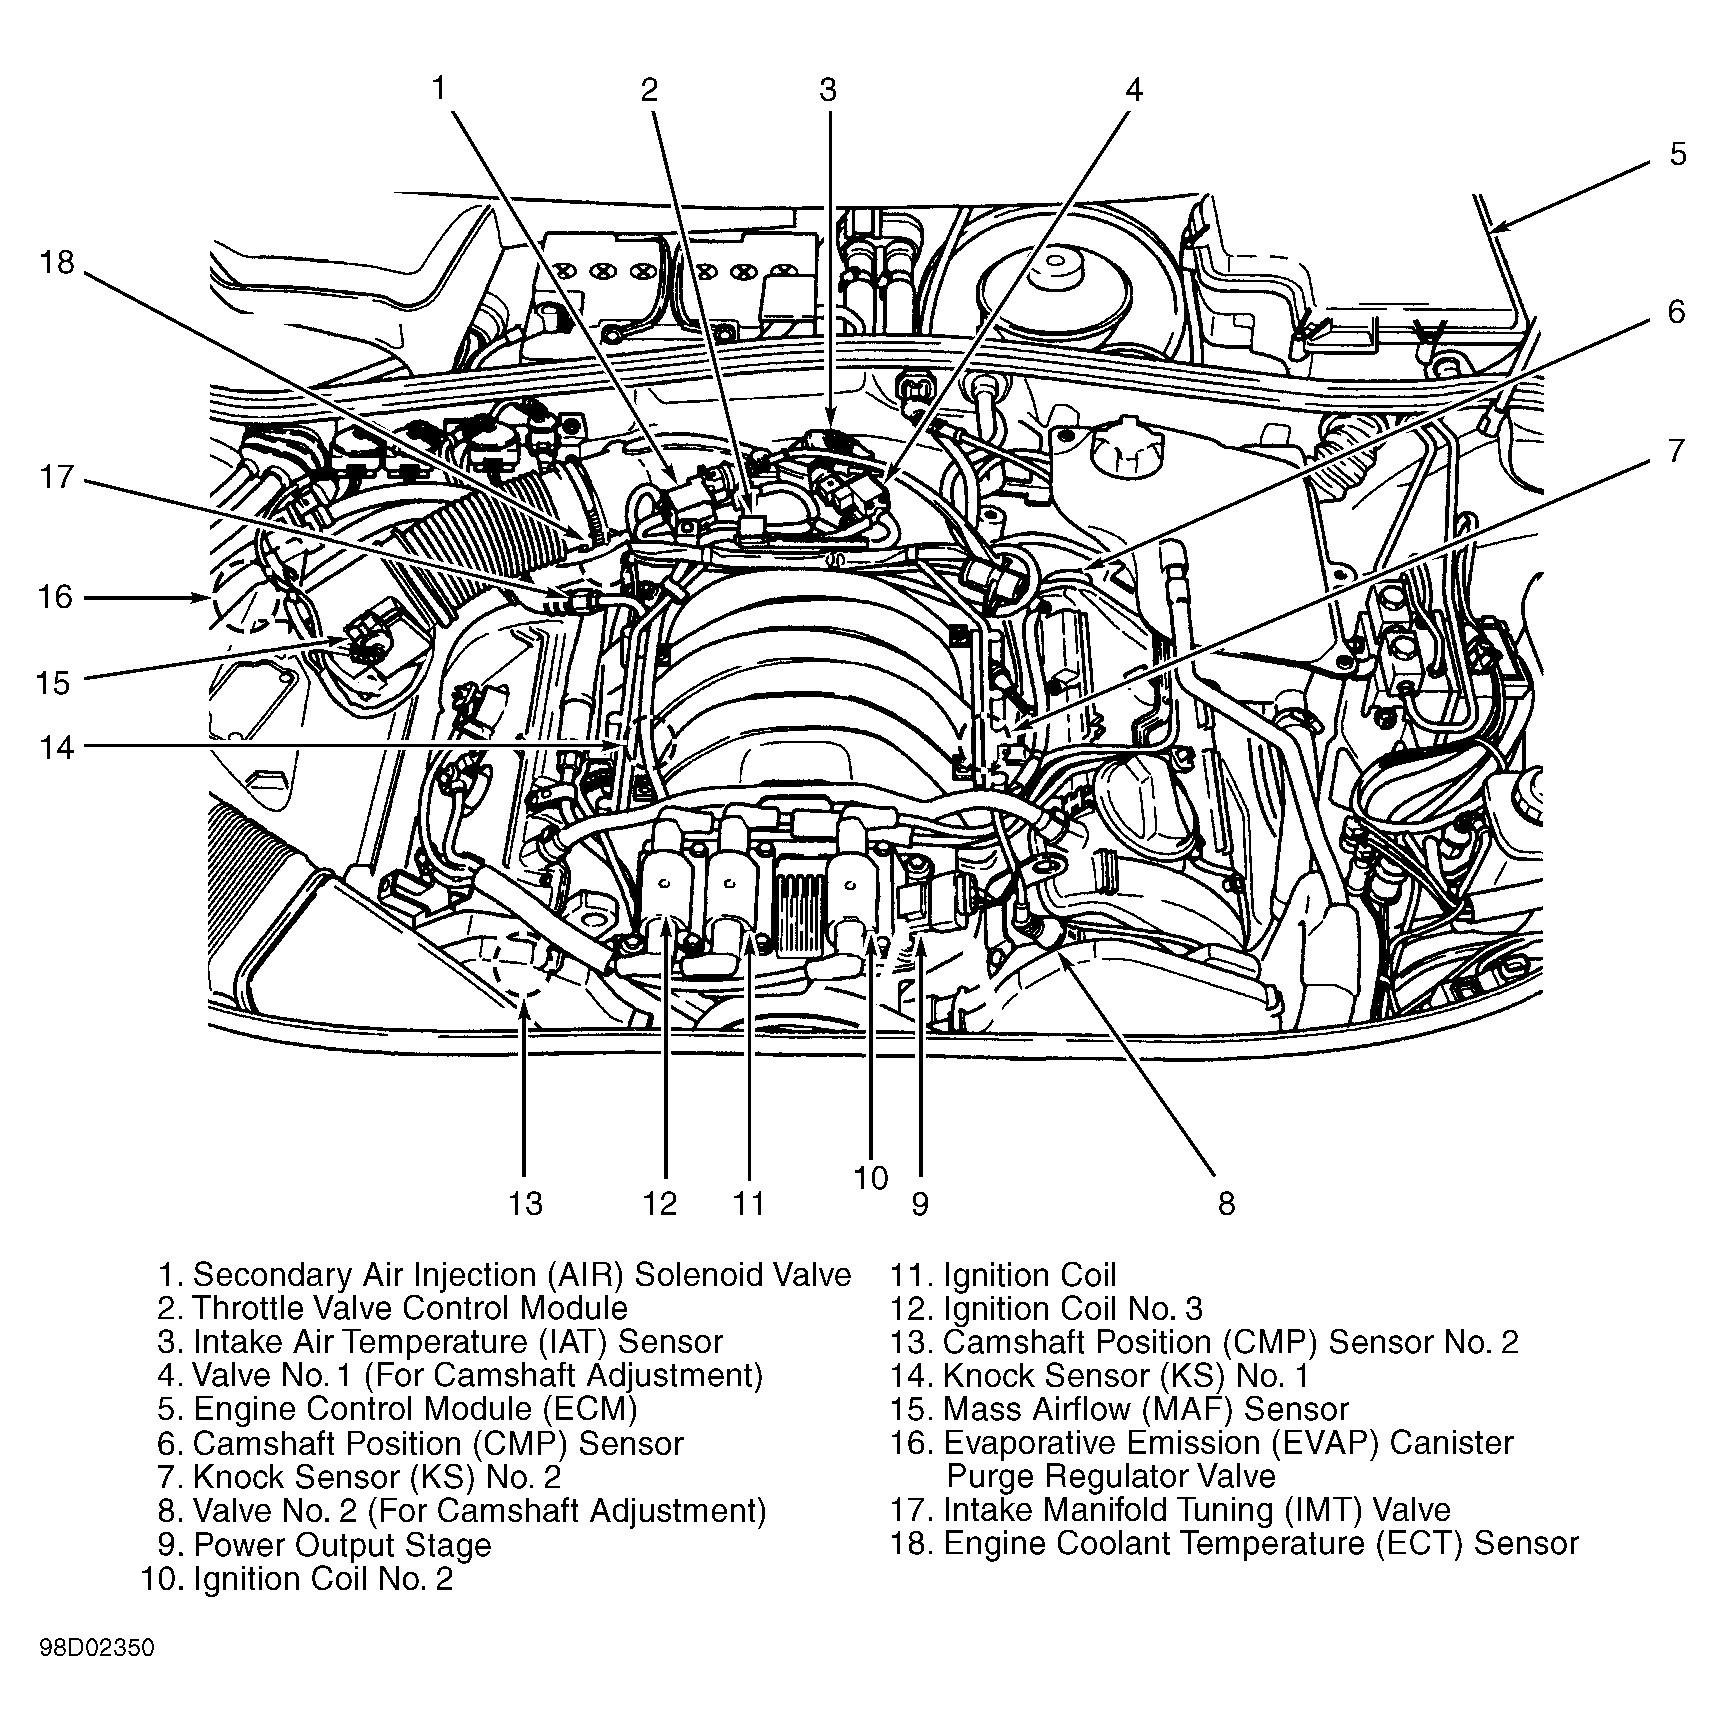 2005 Dodge Grand Caravan Engine Diagram 1999 Dodge Durango 5 9 Engine Diagram Wiring Diagram Datasource Of 2005 Dodge Grand Caravan Engine Diagram